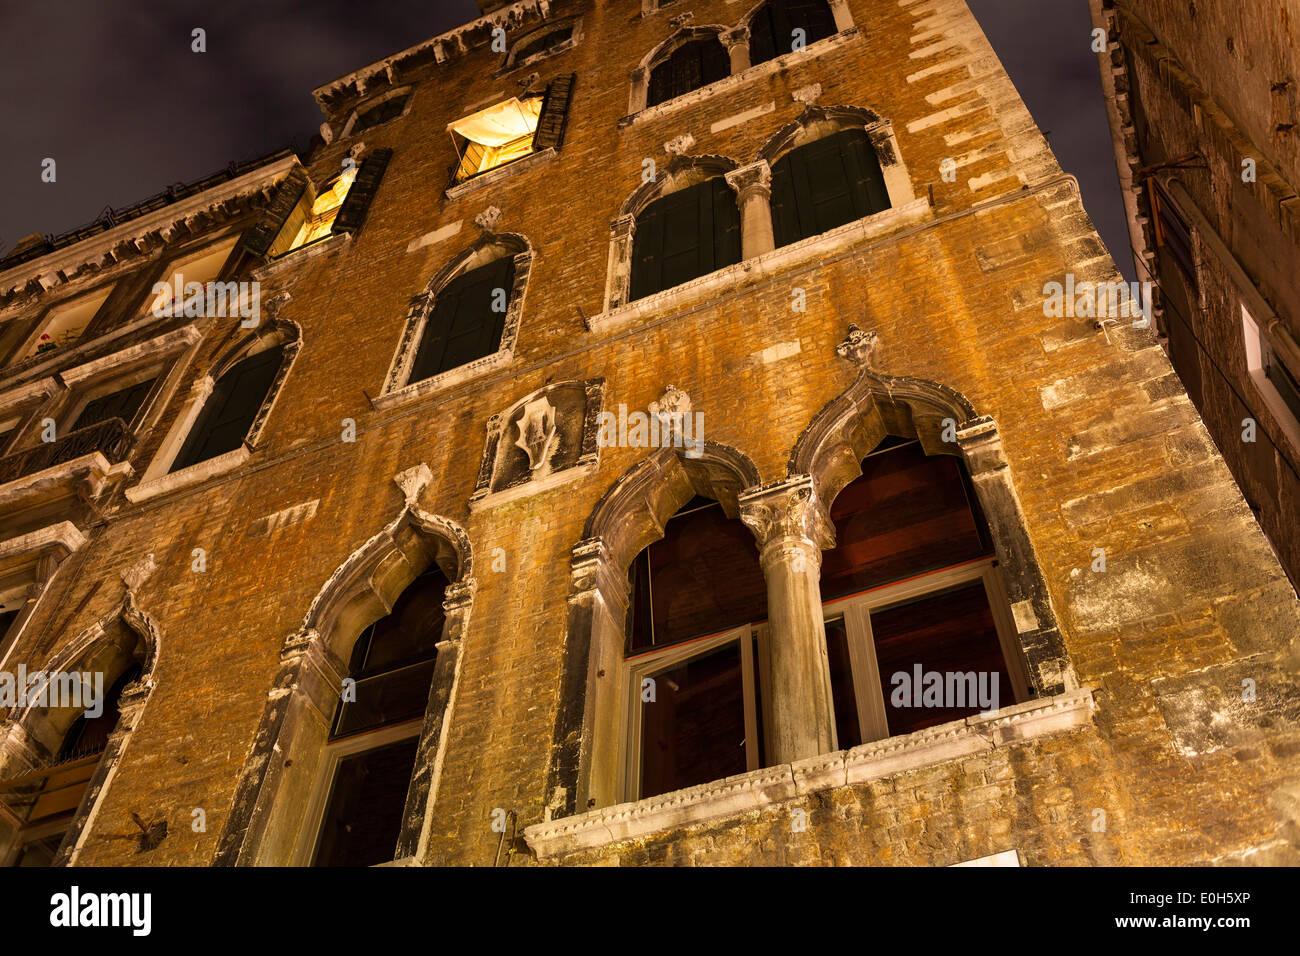 House facade, Venice at night, Venetia, Italy, Europe - Stock Image